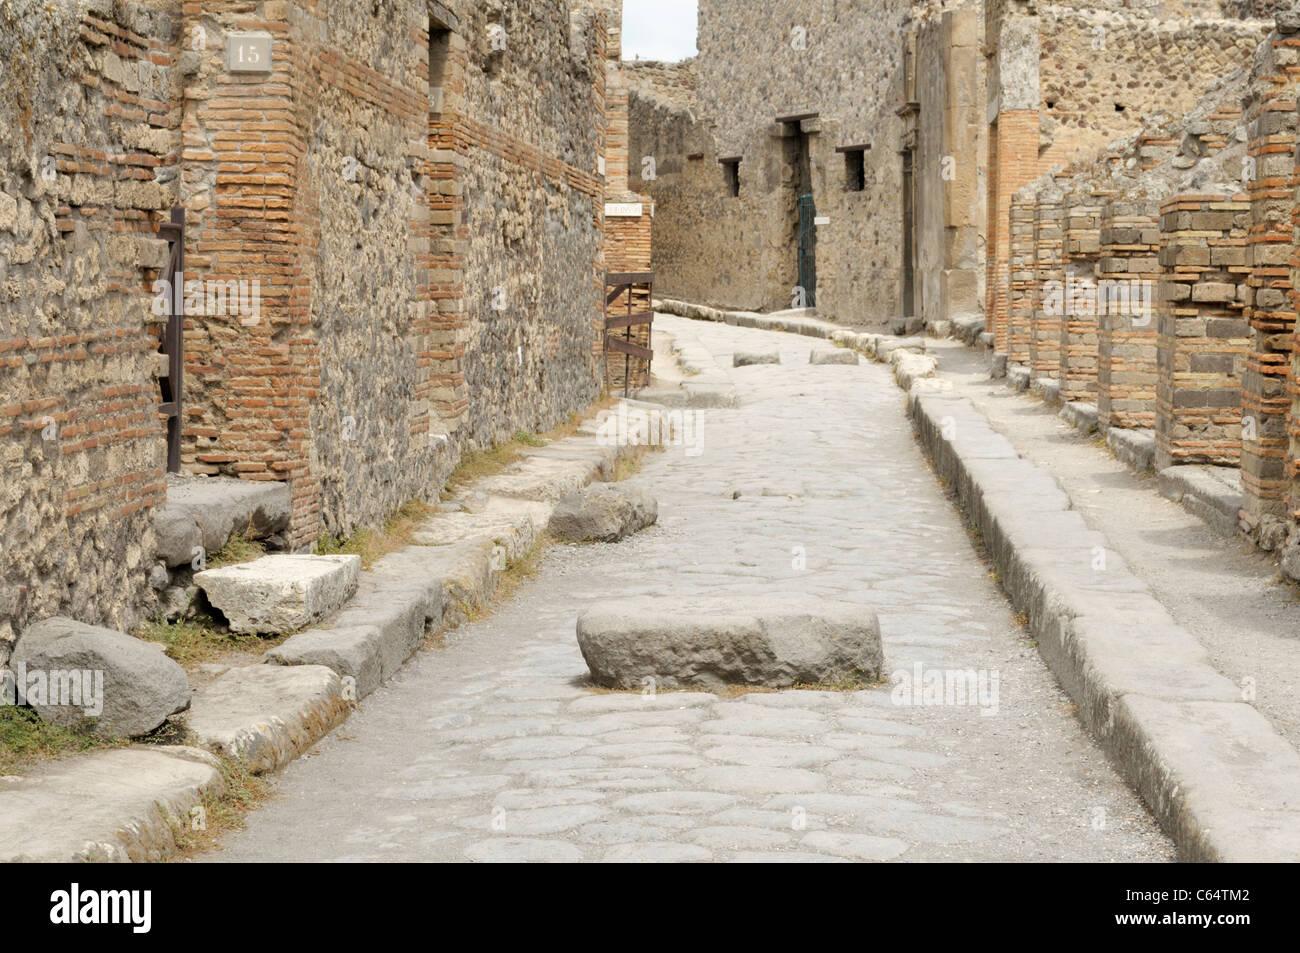 Antigua calle de Pompeya, con el bloque para cruza Imagen De Stock